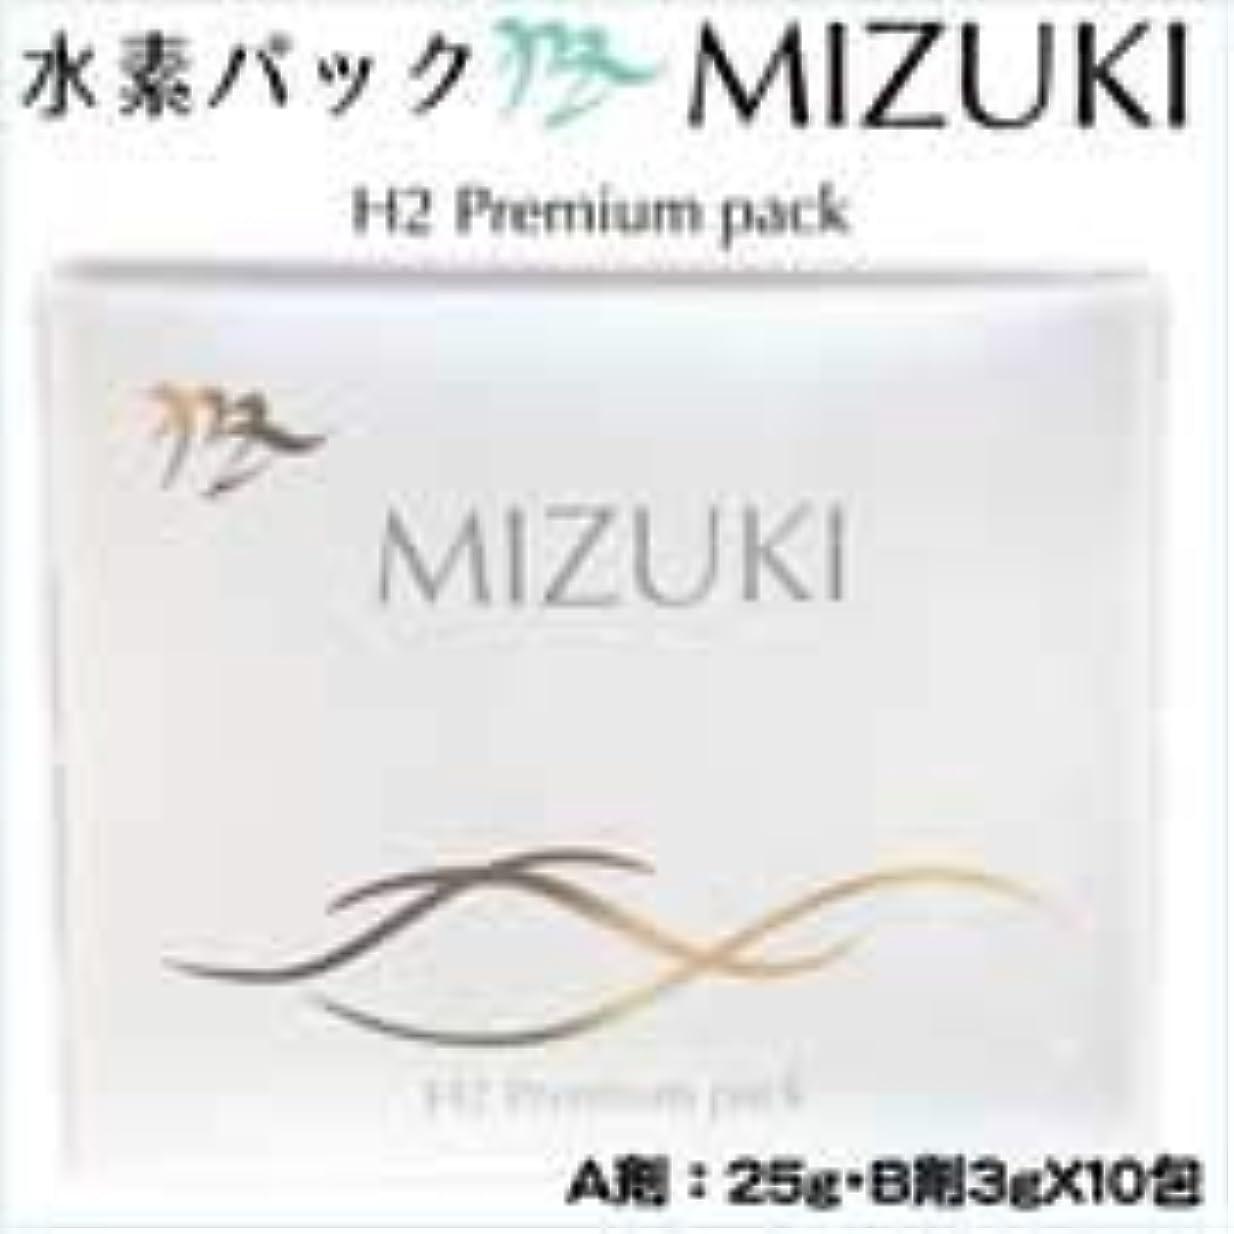 MIZUKI H2 Premium pack ミズキ プレミアムパック A剤:25g、B剤:3gX10包 スパチュラ付き